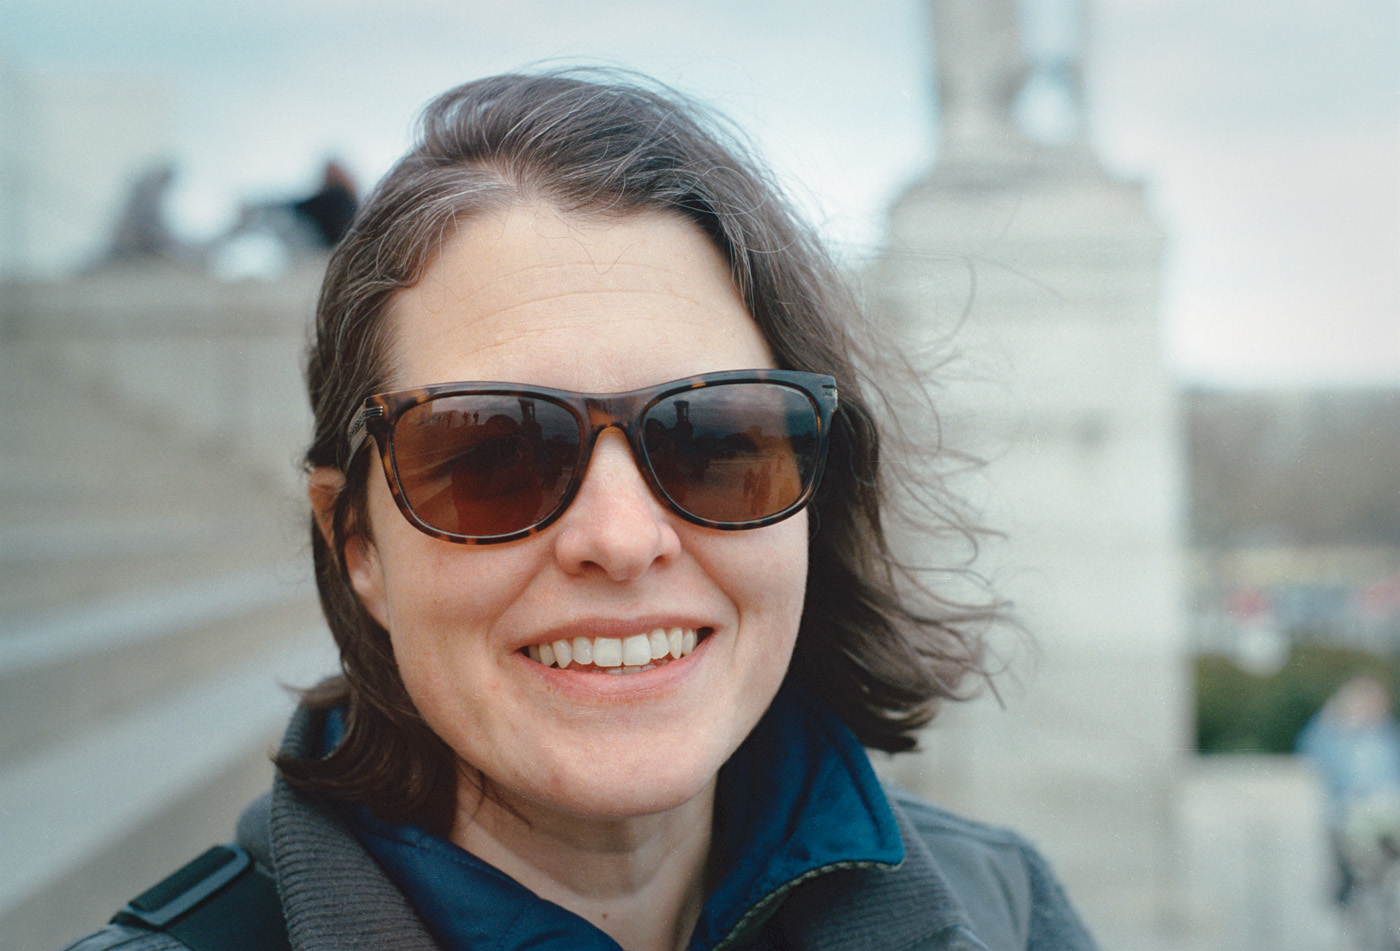 Kat at the Lincoln Memorial  |  Frame 24